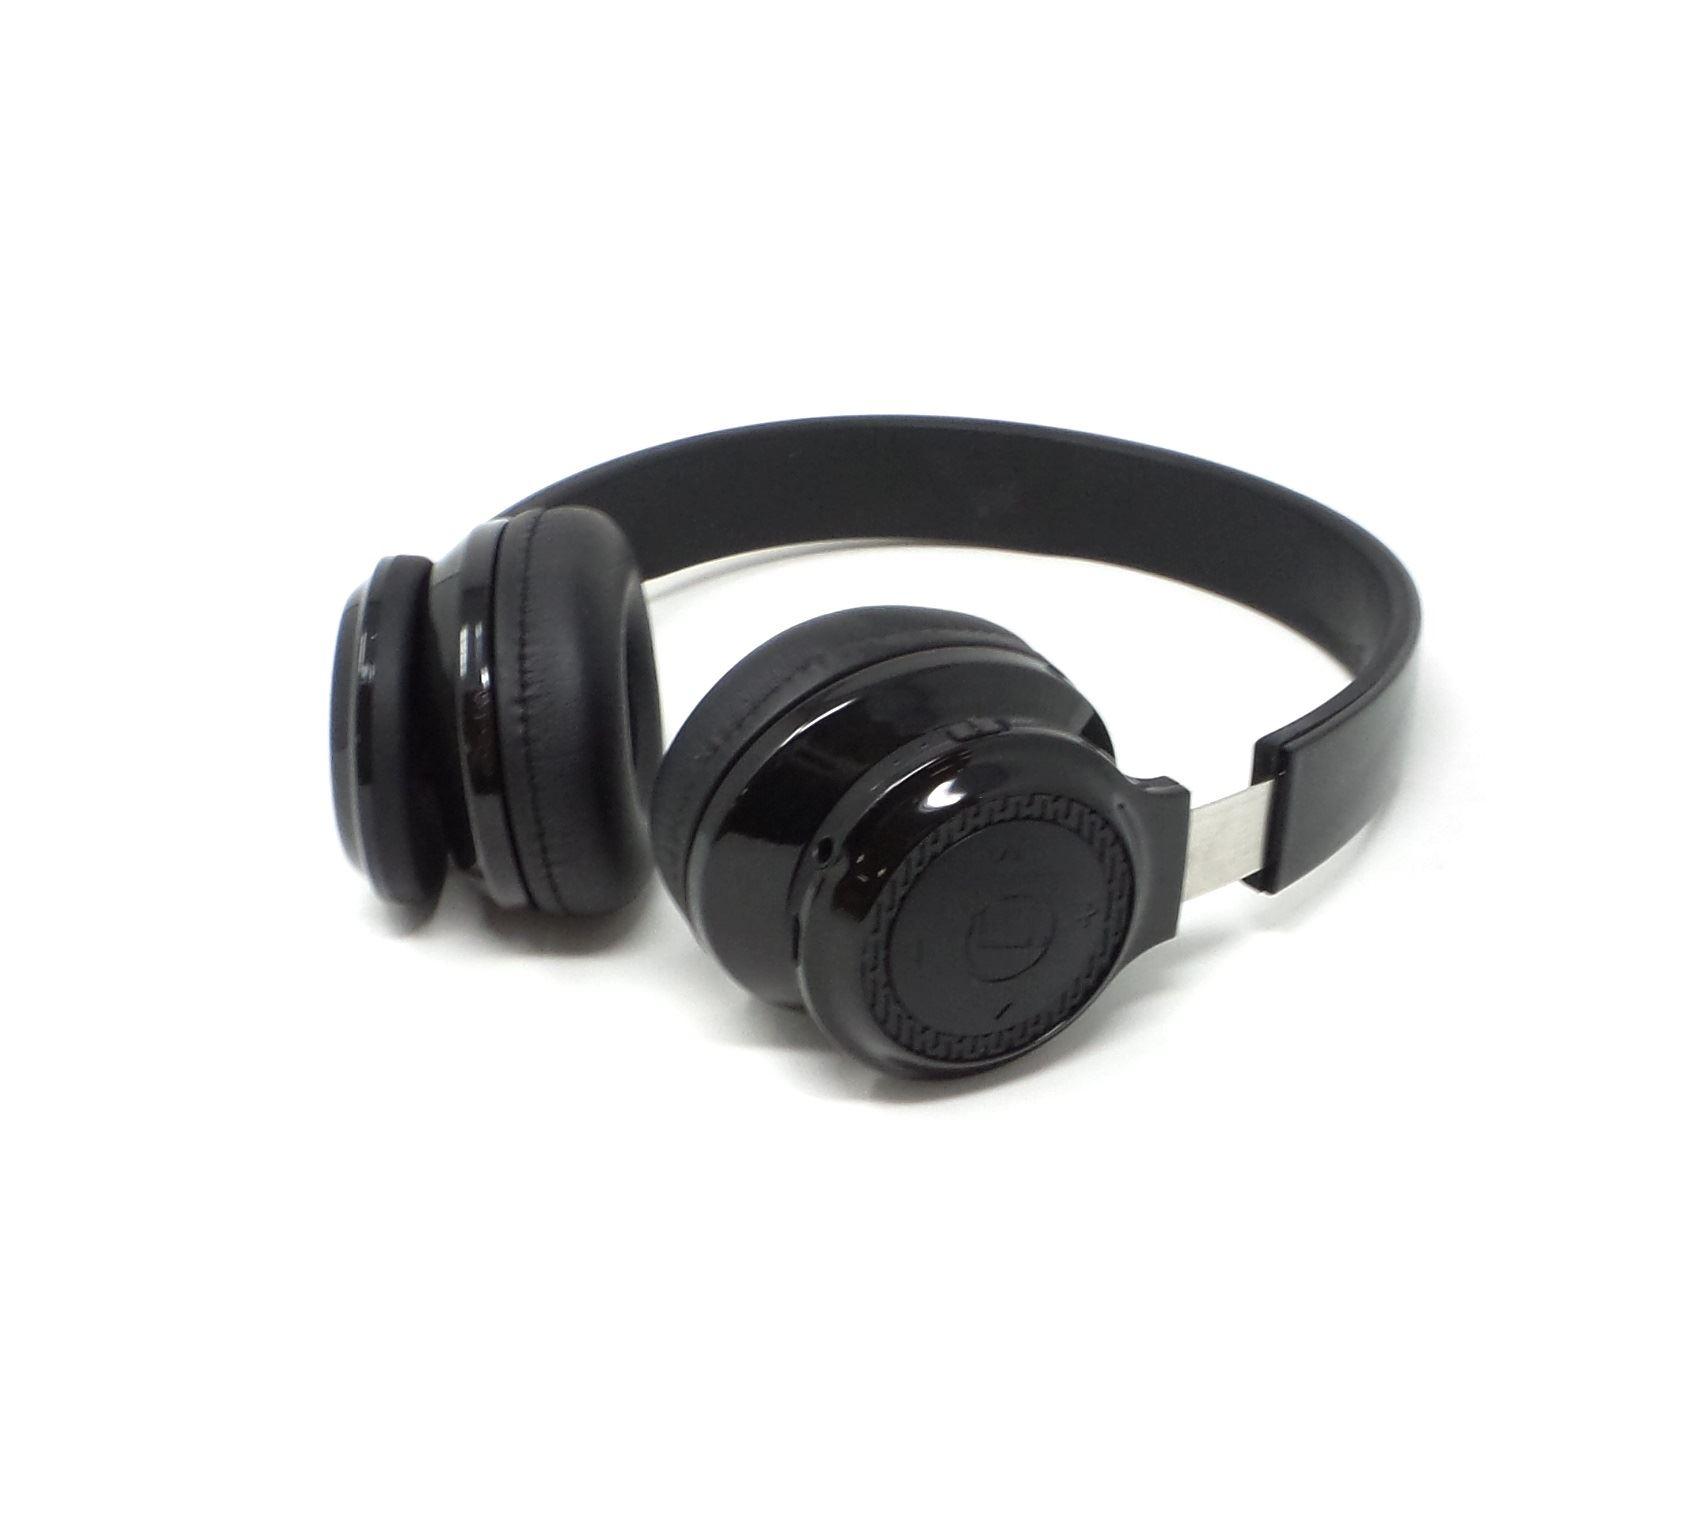 JAM Already There Wireless On-Ear Headphones Black HX